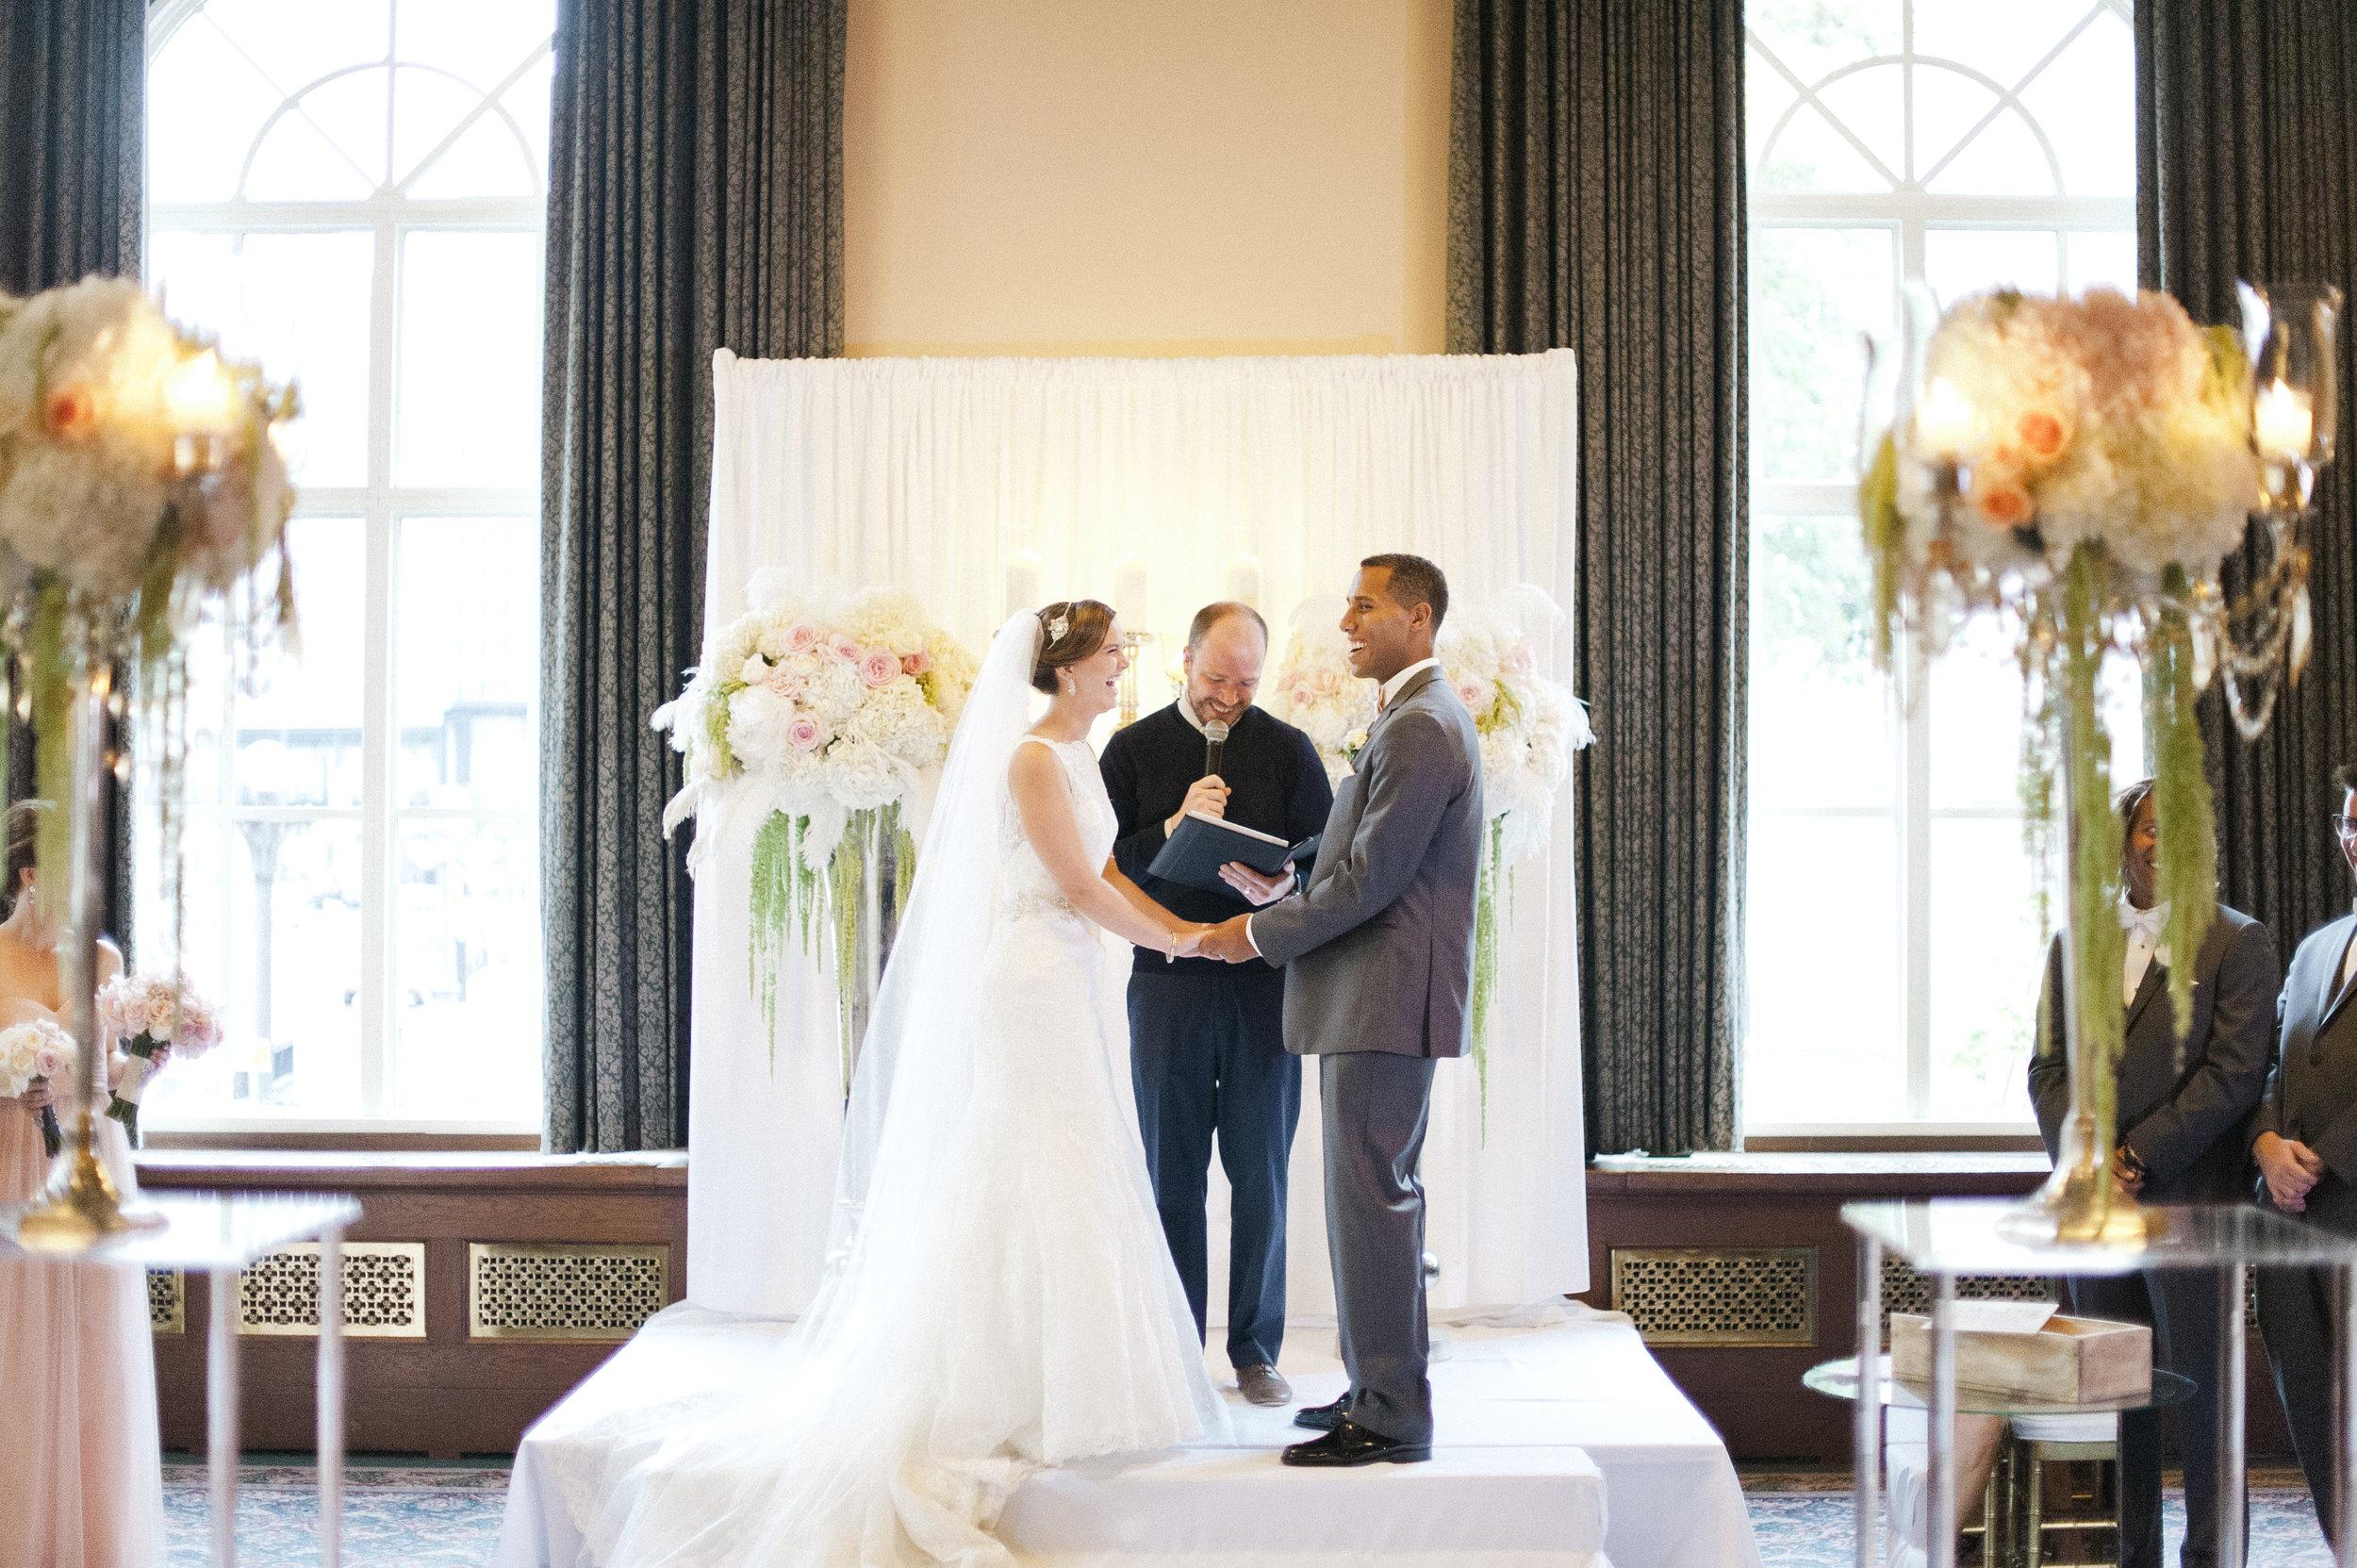 Lovell-Dillahunty Wedding_644.jpg